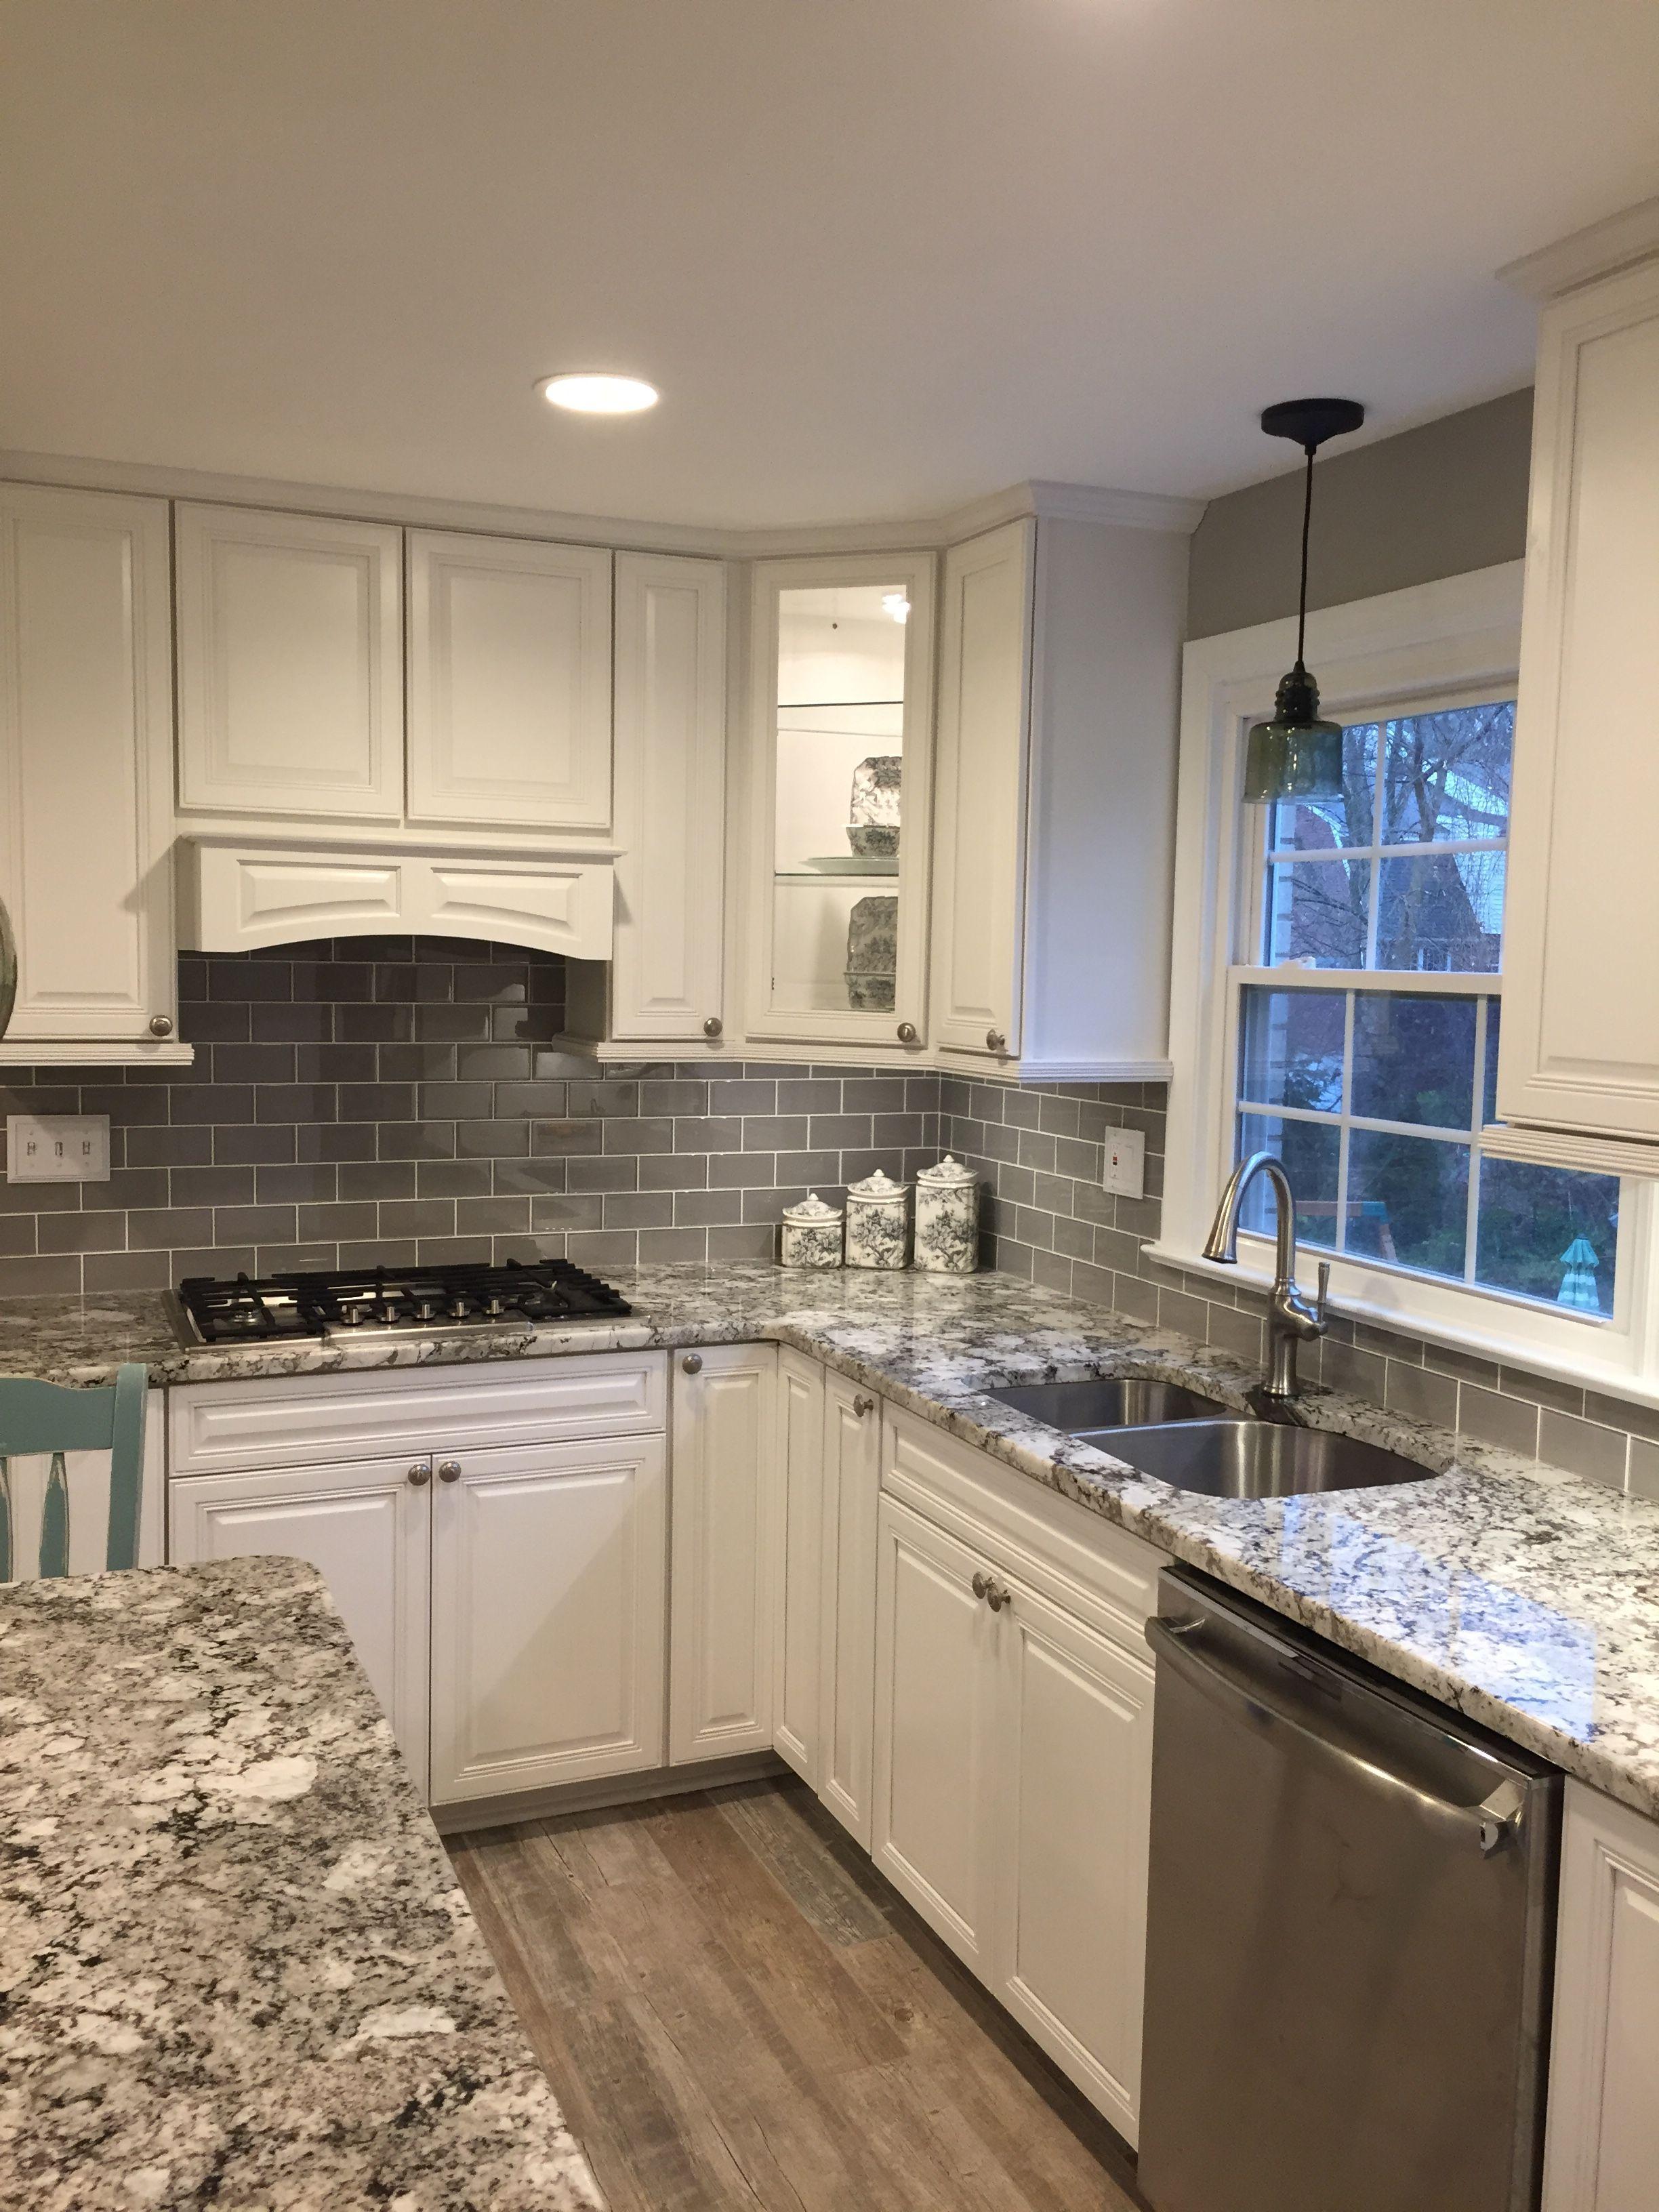 7 Creative Subway Tile Backsplash Ideas For Your Kitchen Kitchen Backsplashes Kitchen Remodel Small Kitchen Backsplash Designs Farmhouse Kitchen Backsplash